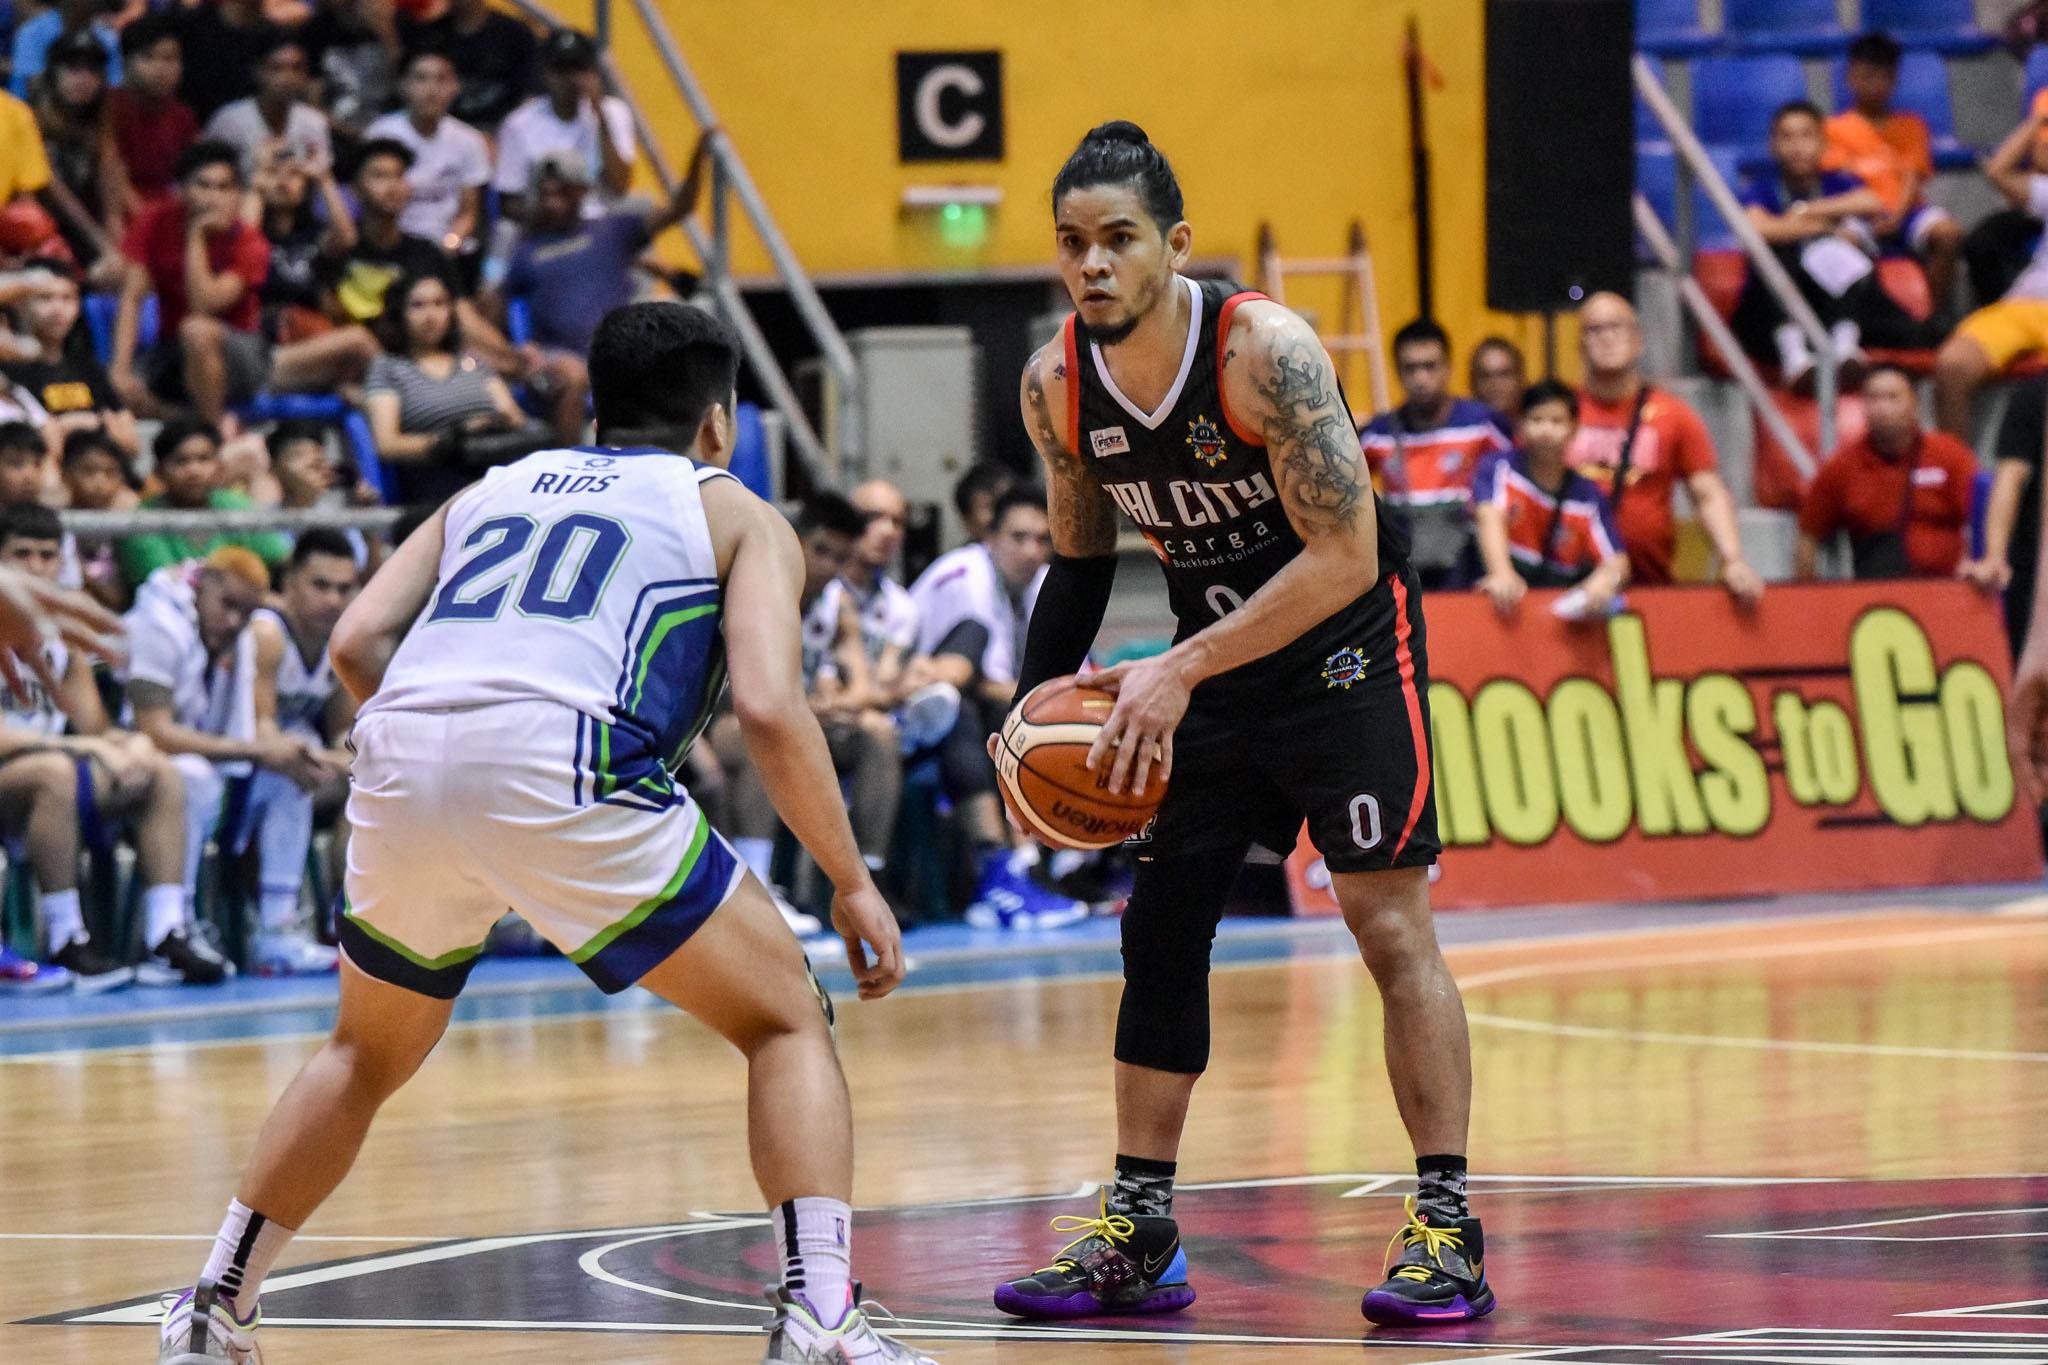 Tiebreaker Times Paulo Hubalde repays Valenzuelans despite disappointing campaign: 'Hindi nila kami iniwan' Basketball MPBL News  Valenzuela Classic Paulo Hubalde 2019-20 MPBL Lakan Cup